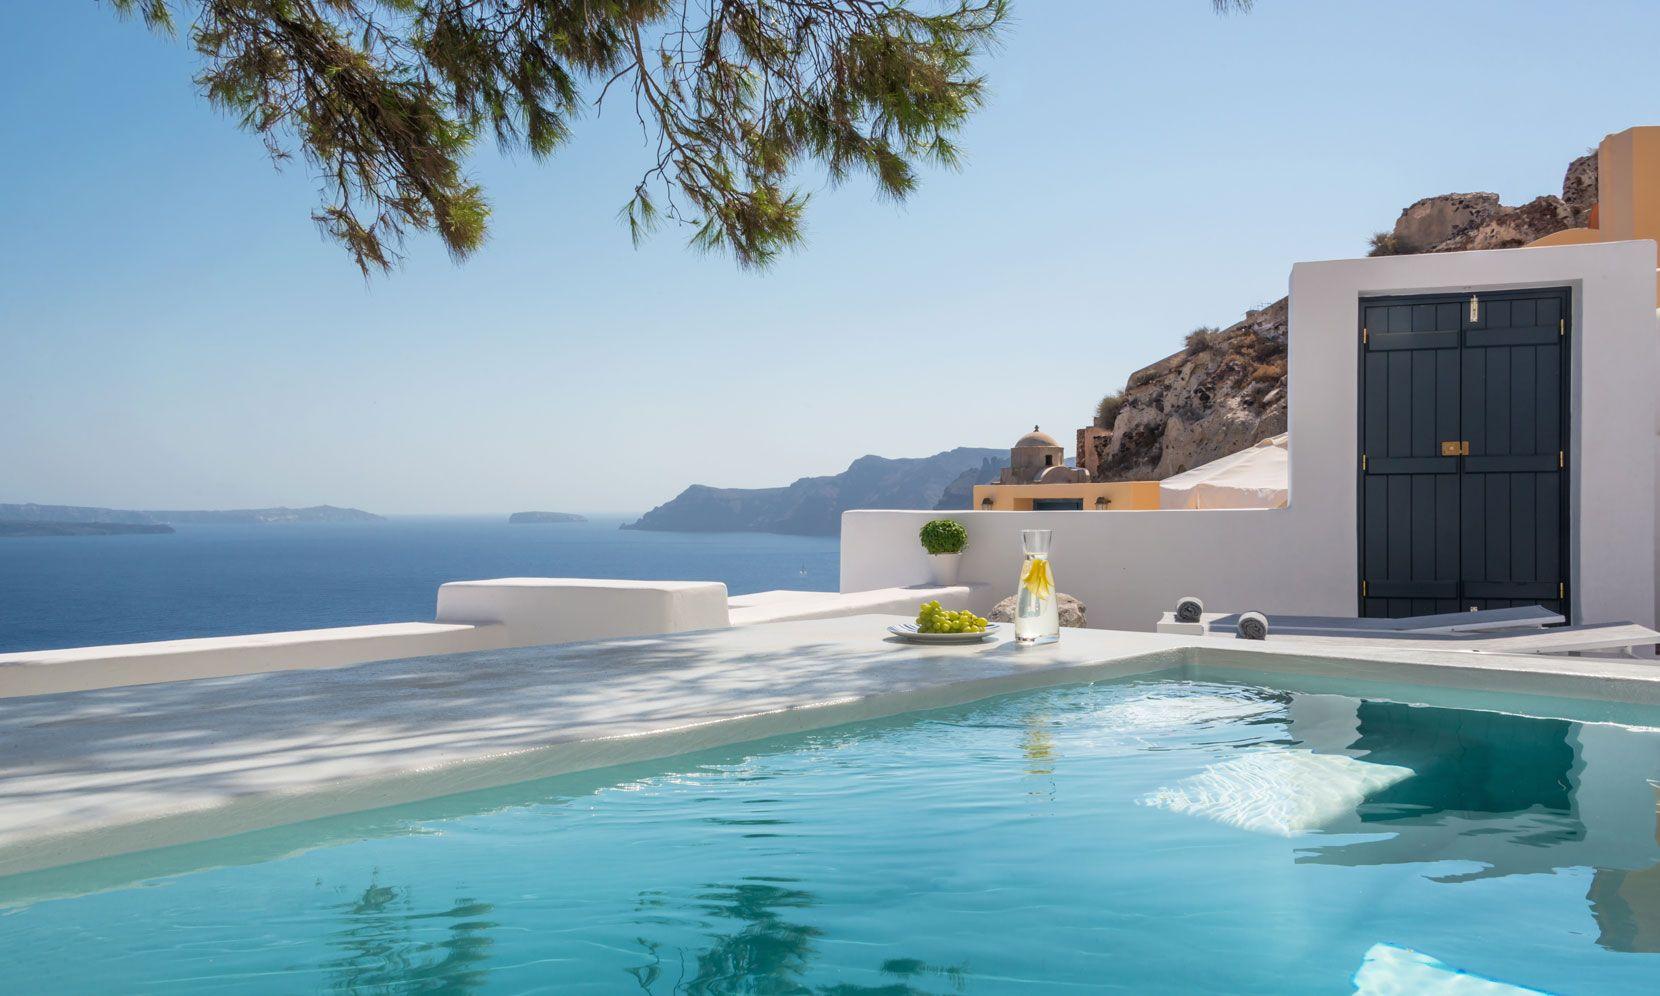 Santorini Villa Palma jumbotron image